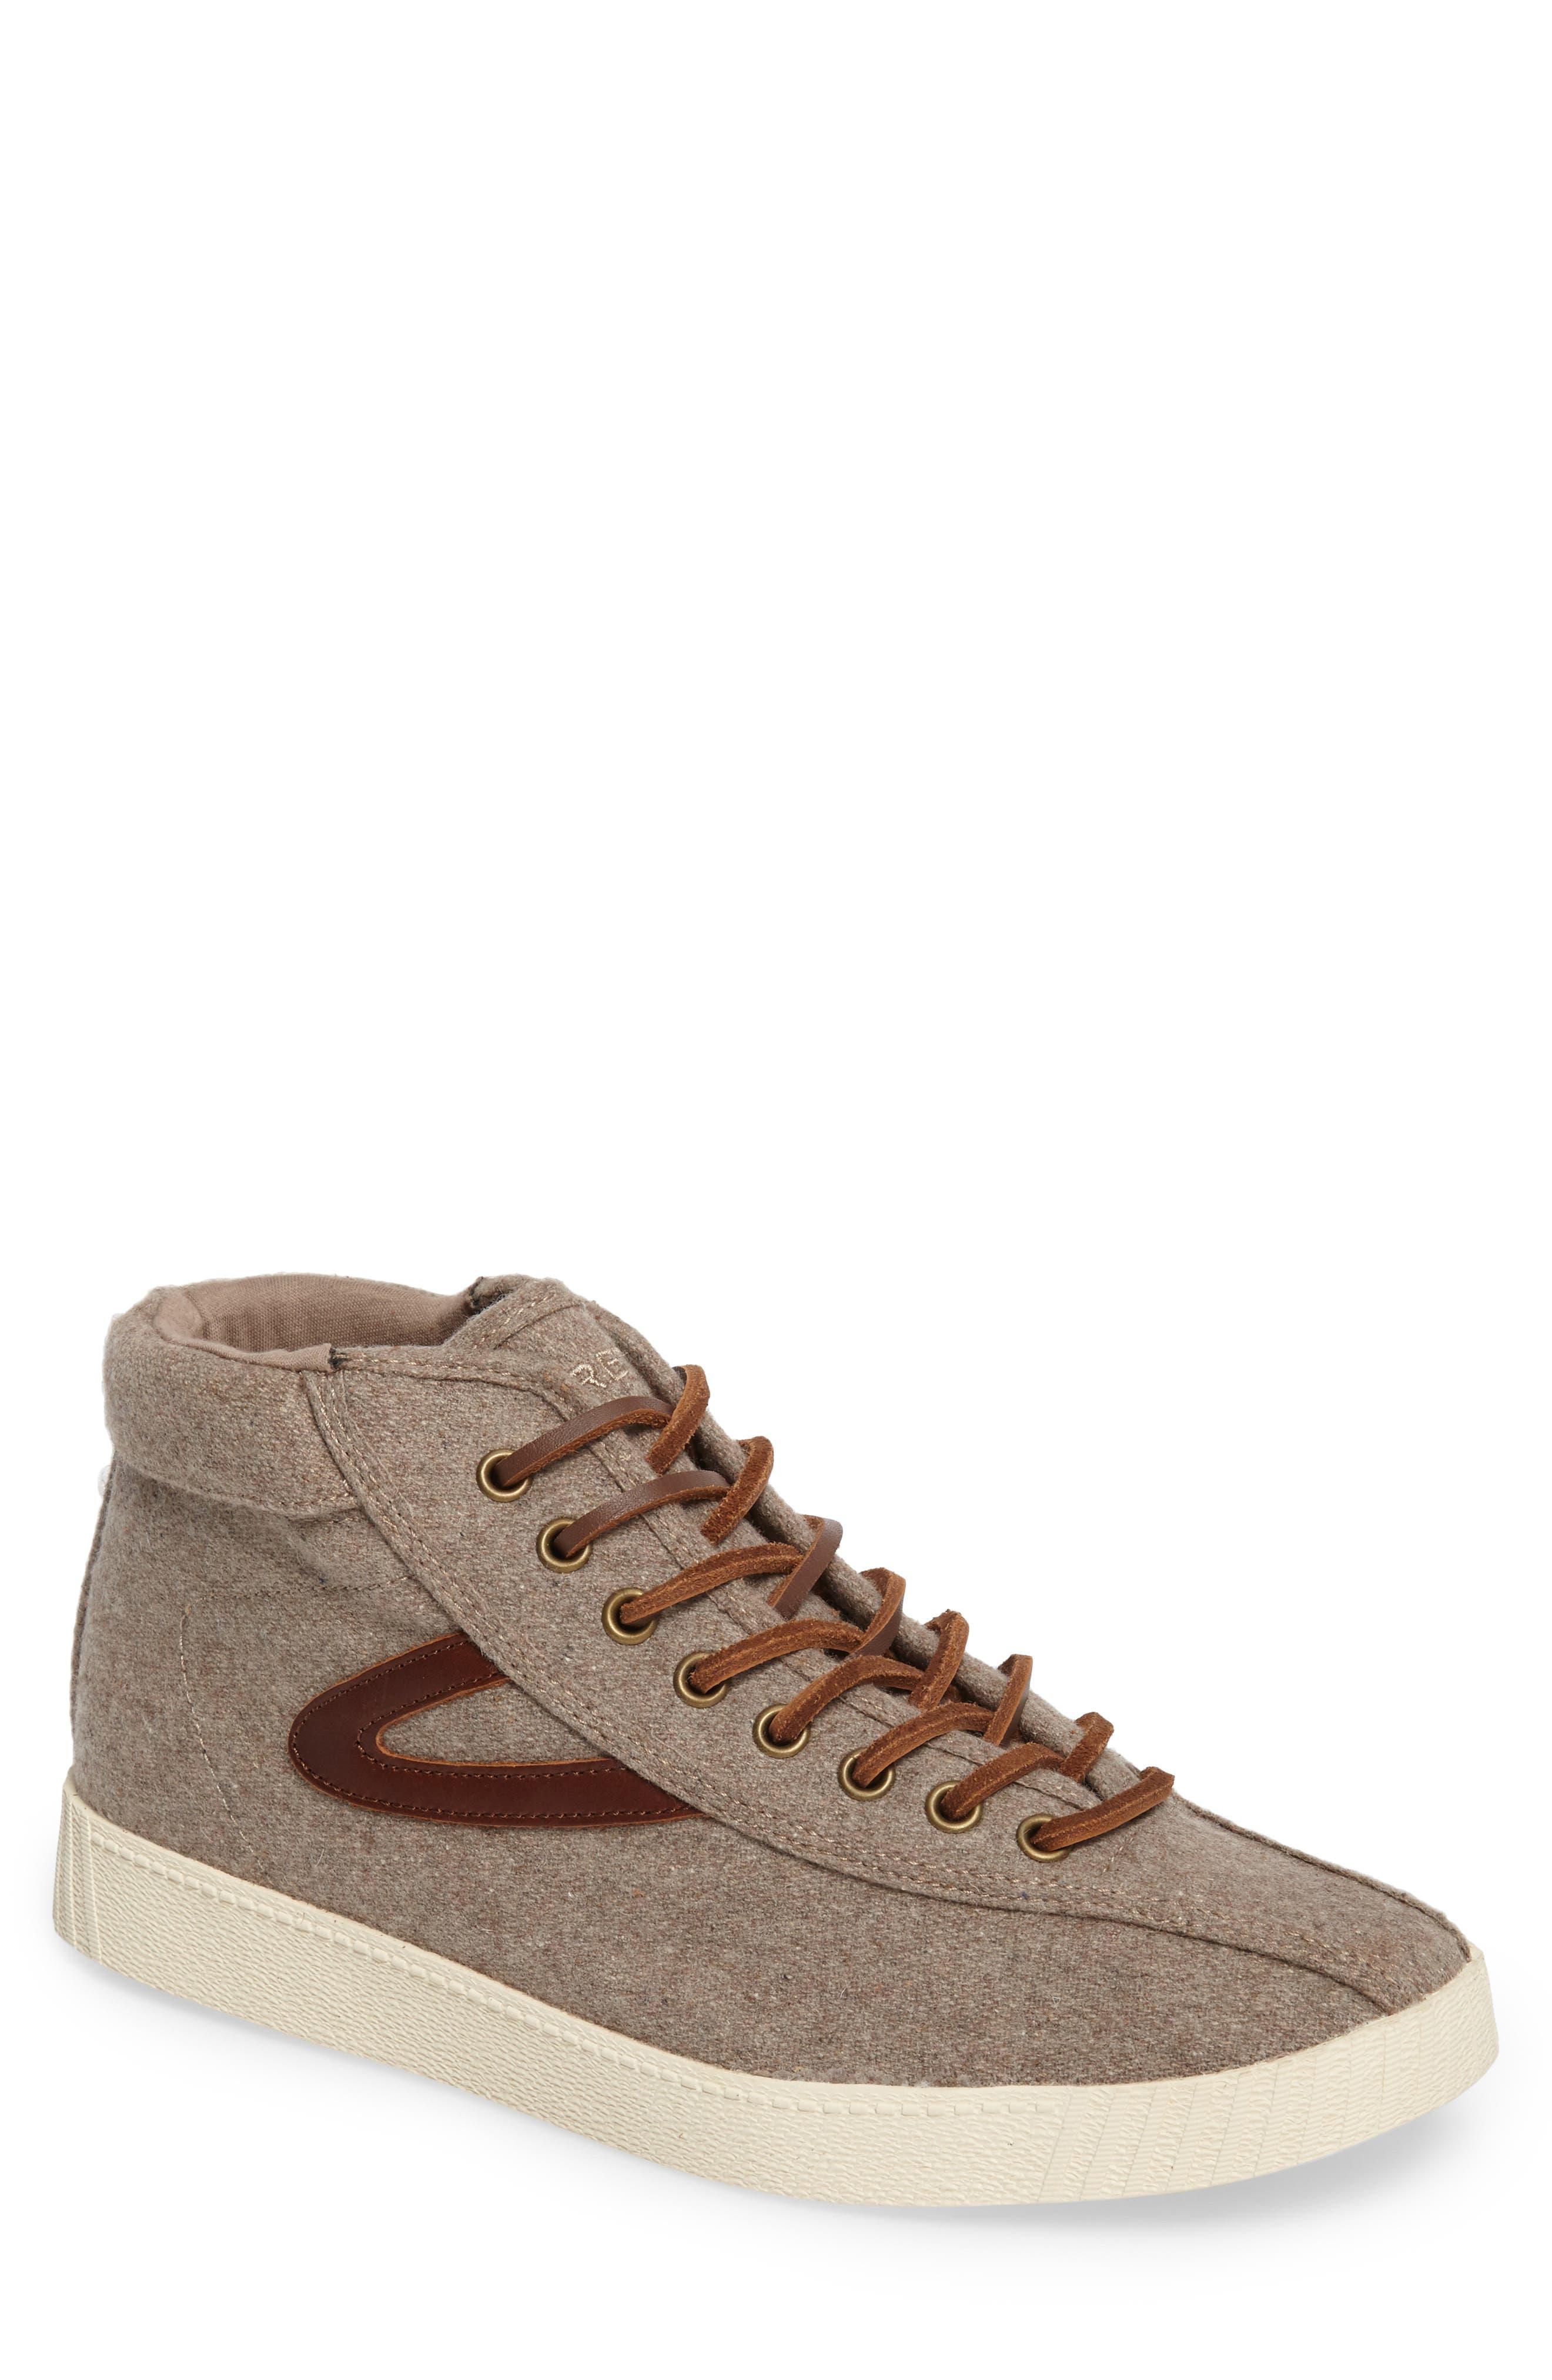 Tretorn Nylite Hi 4 Sneaker (Men)